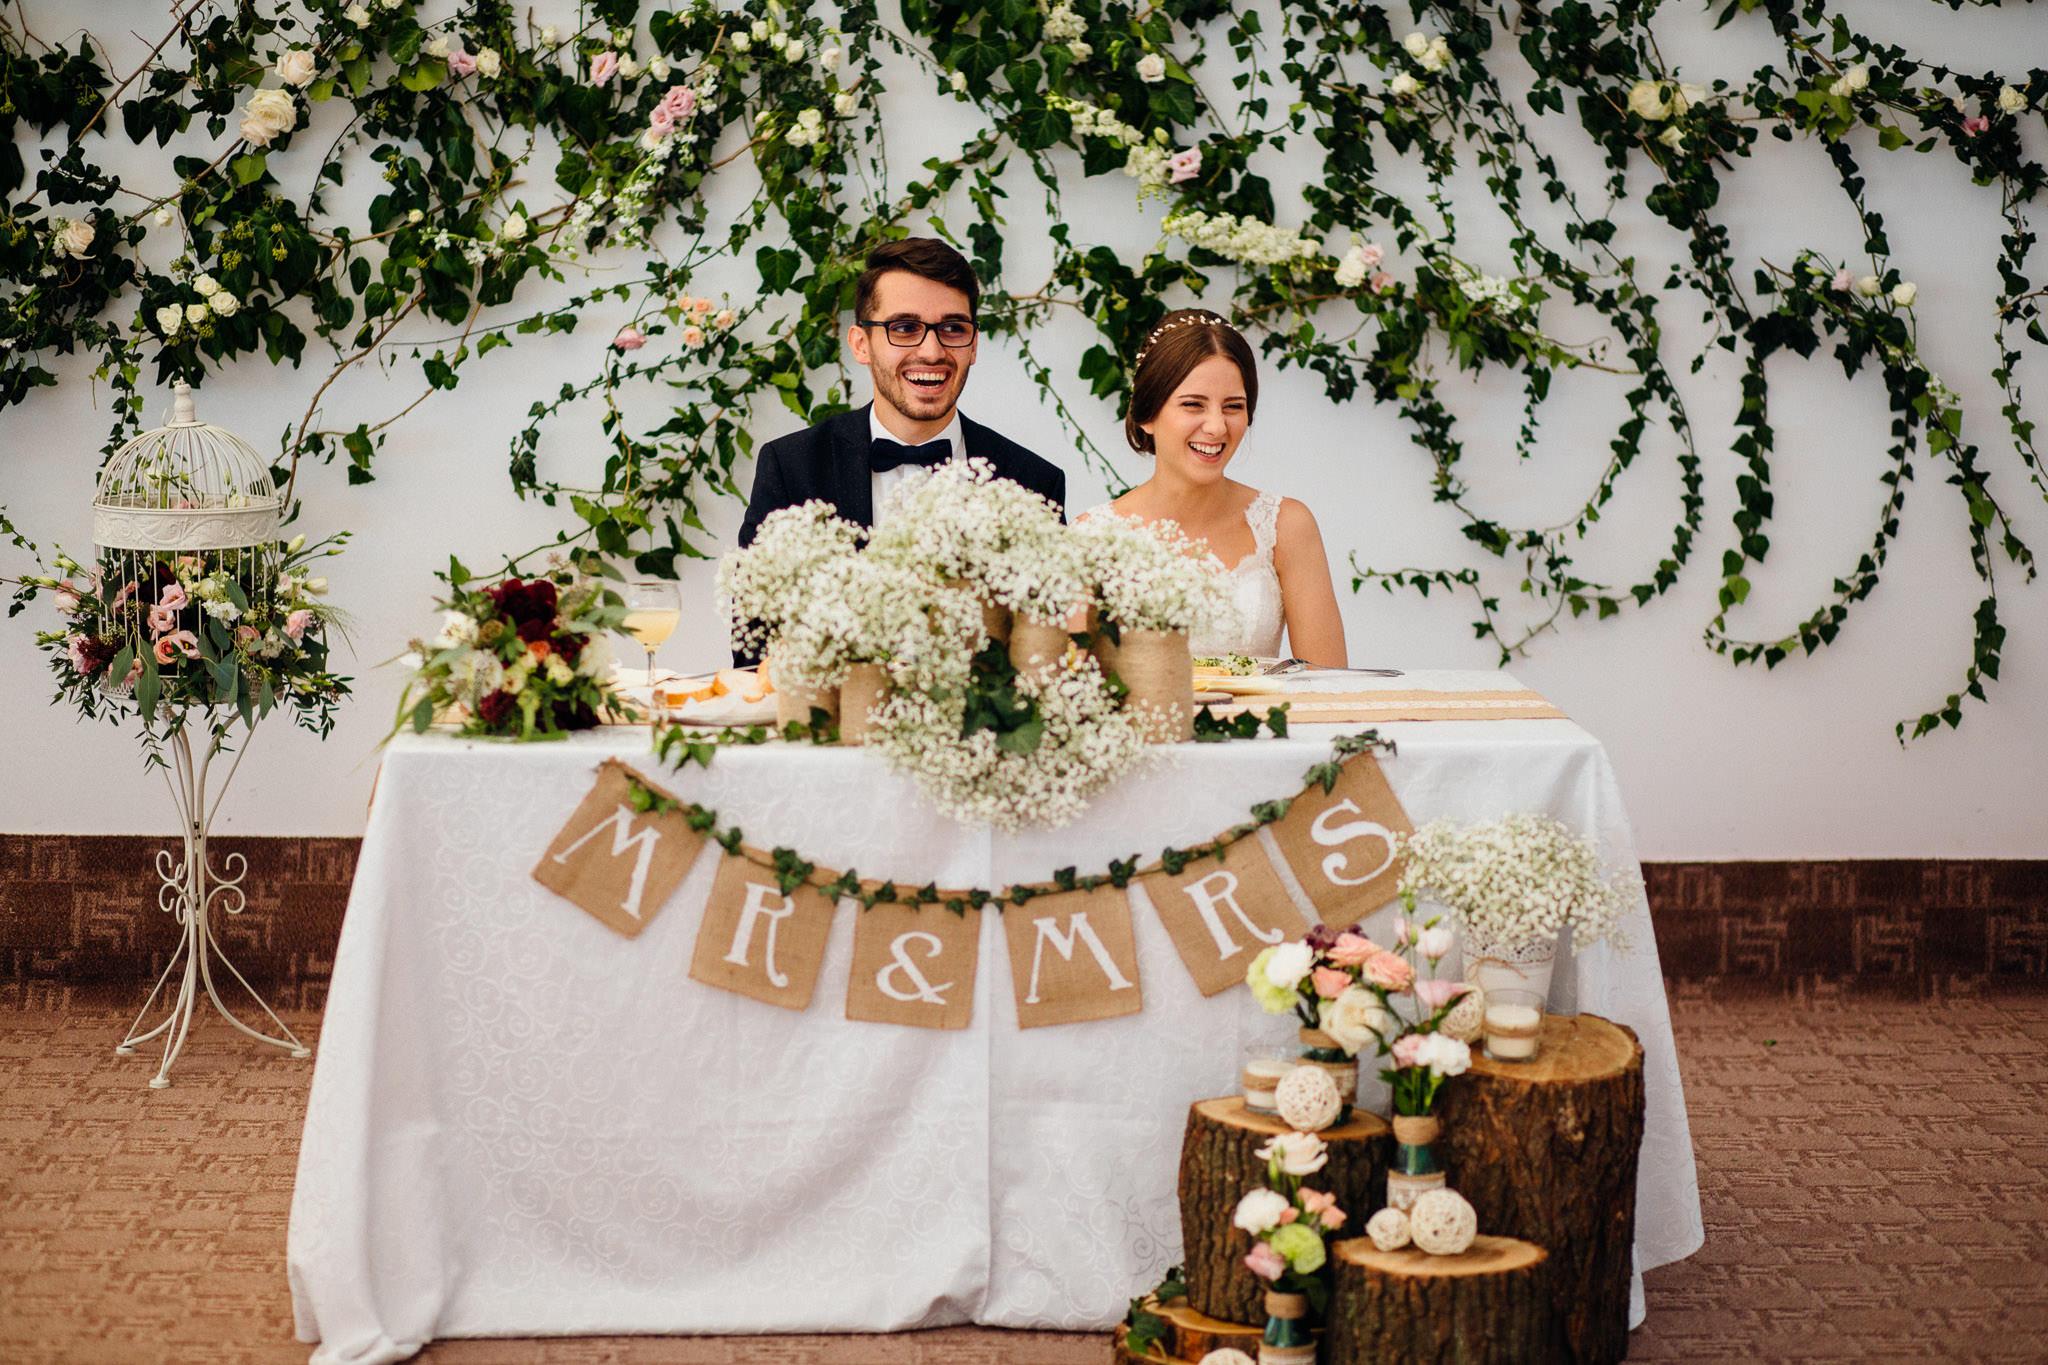 Beniamin & Ana fotograf nunta vintage Bucuresti-1172